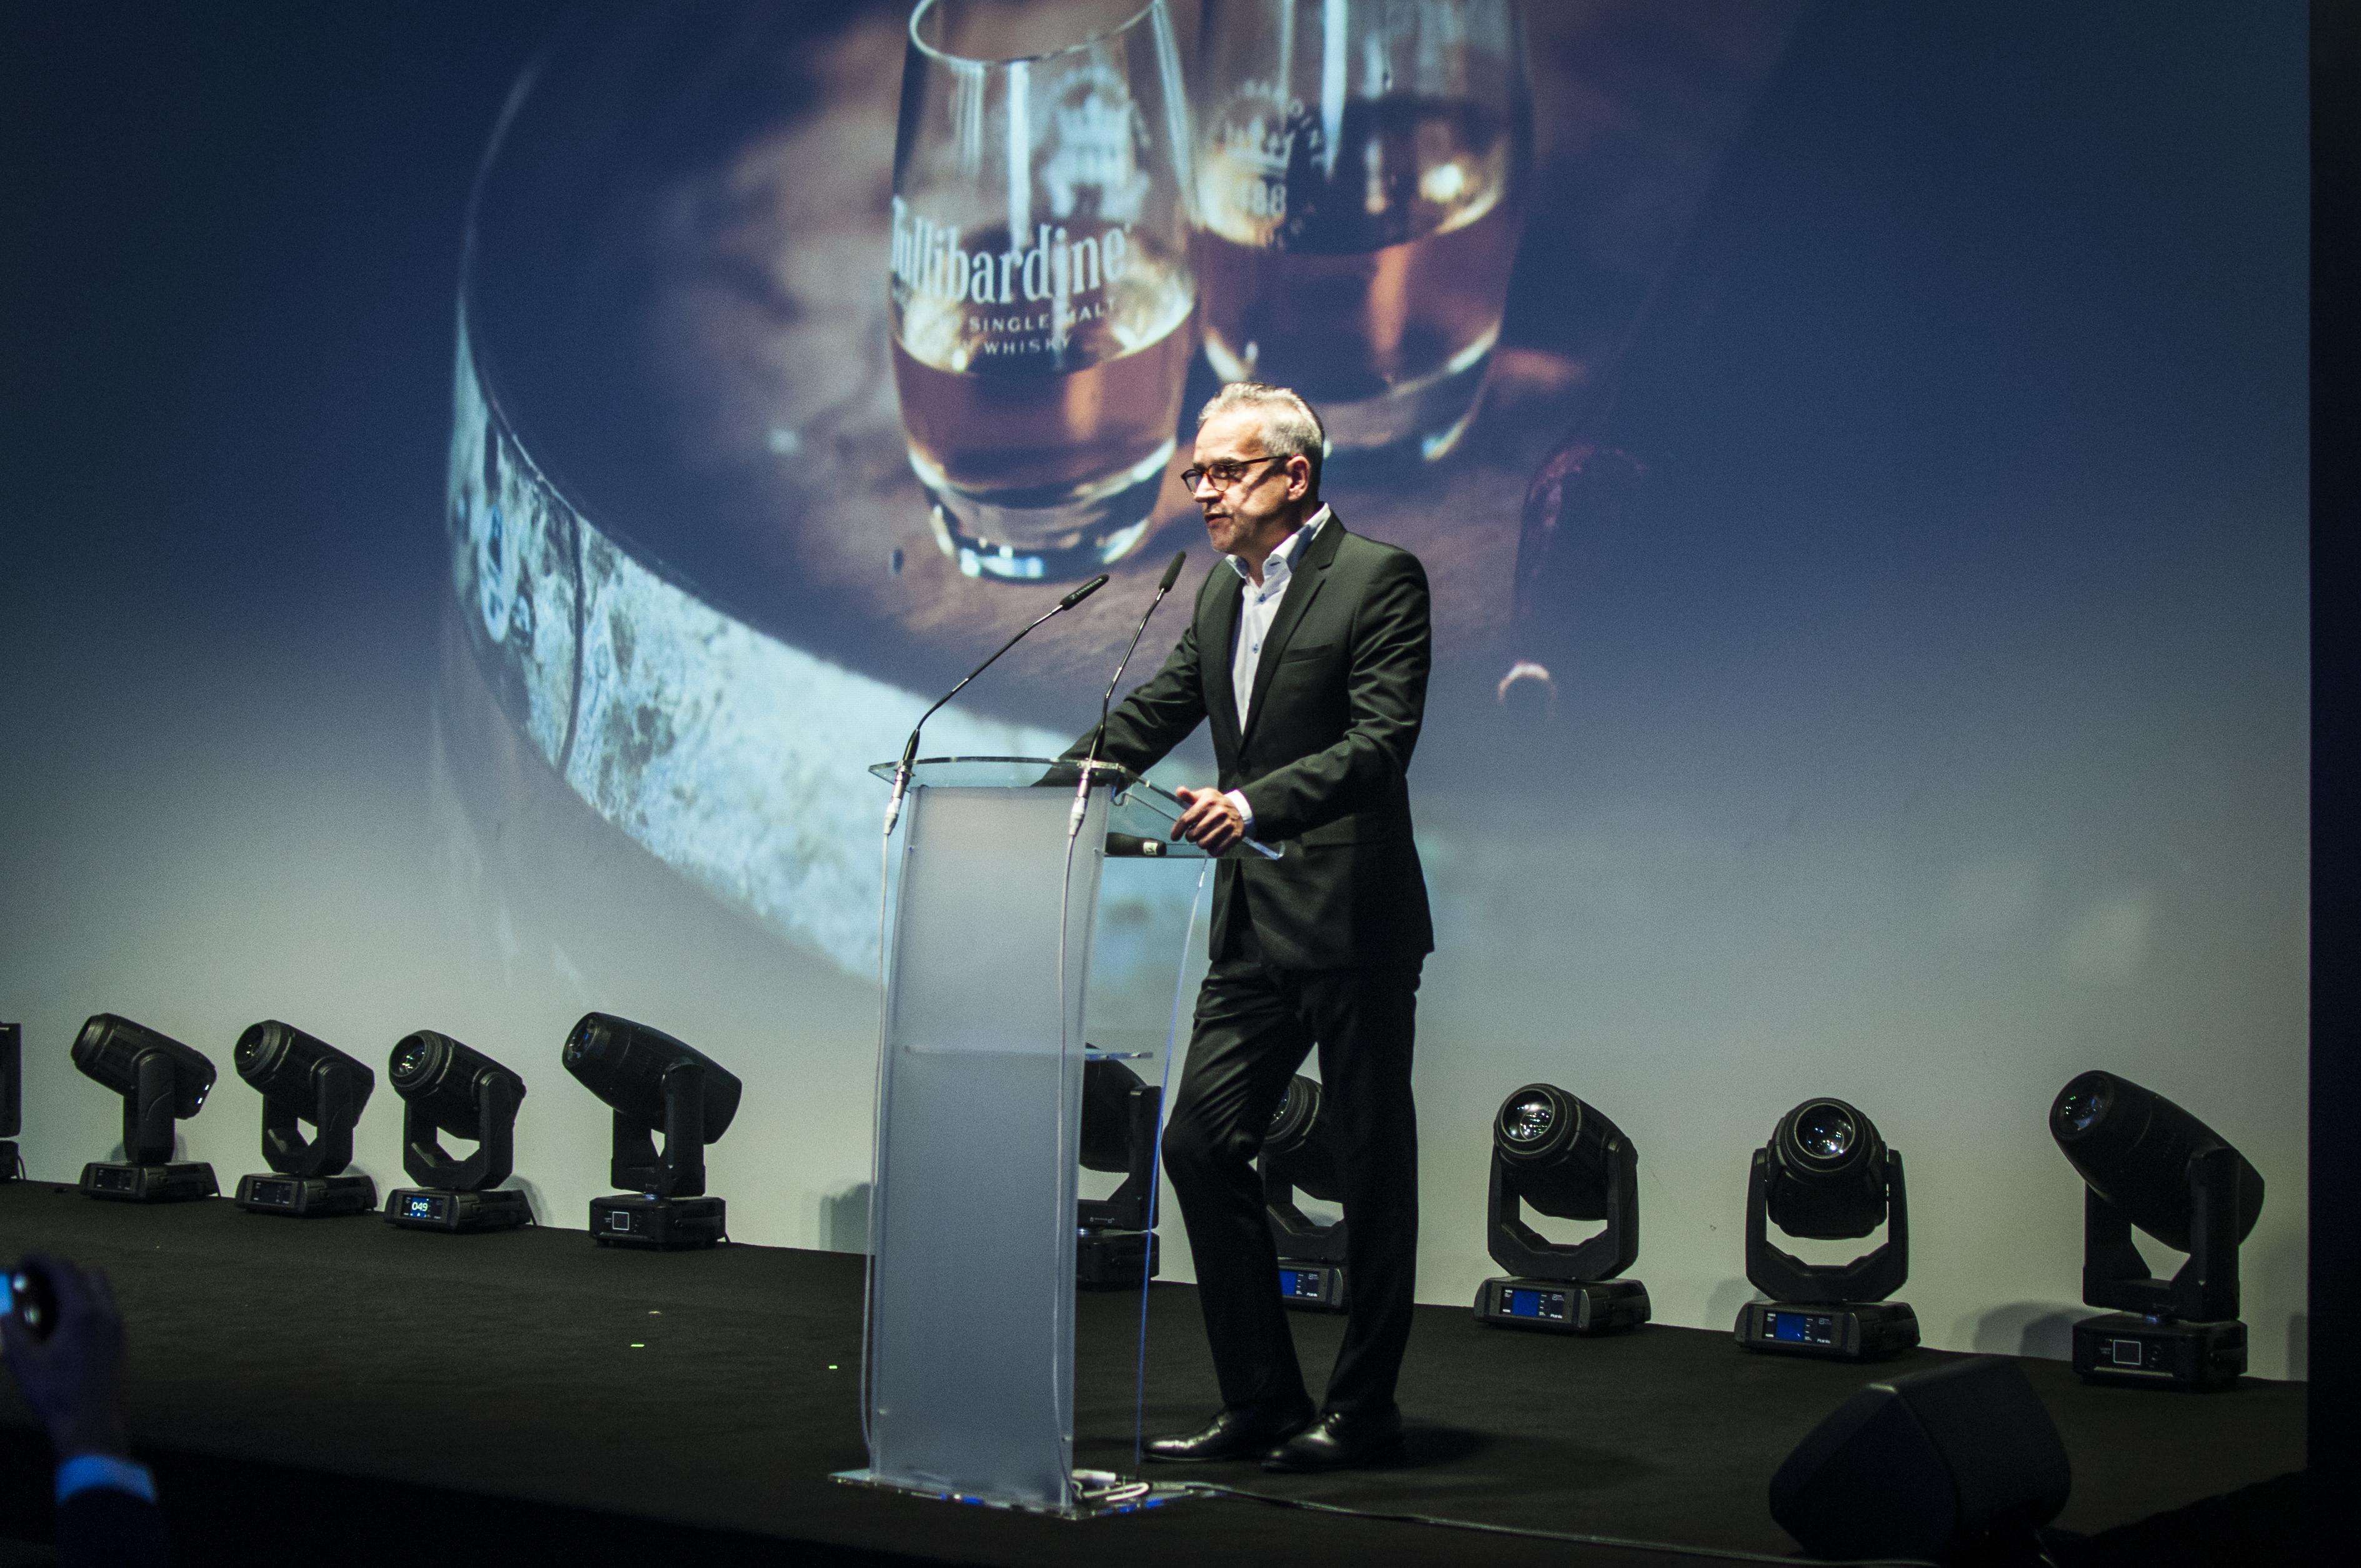 Tullibardine whisky podczas plebiscytu Tech Awards